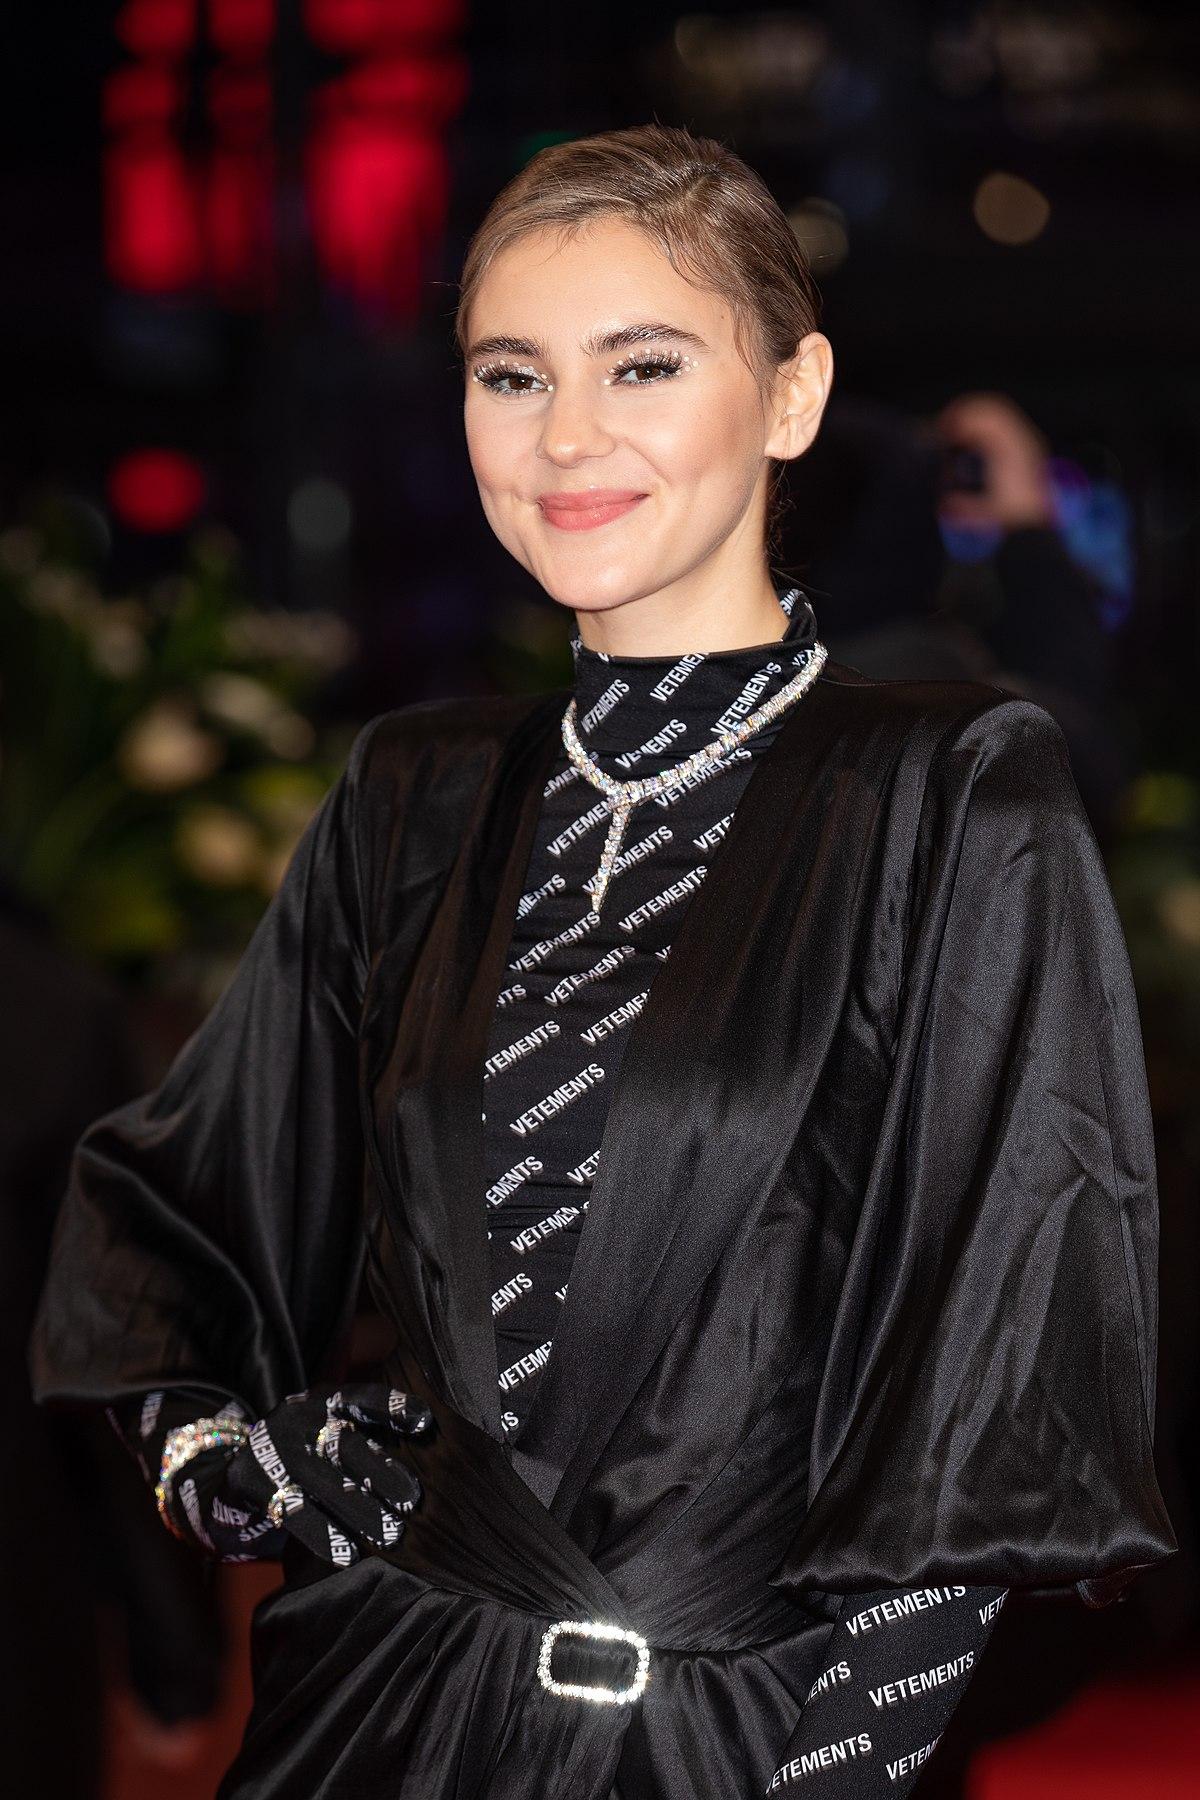 Stefanie Giesinger Wikipedia